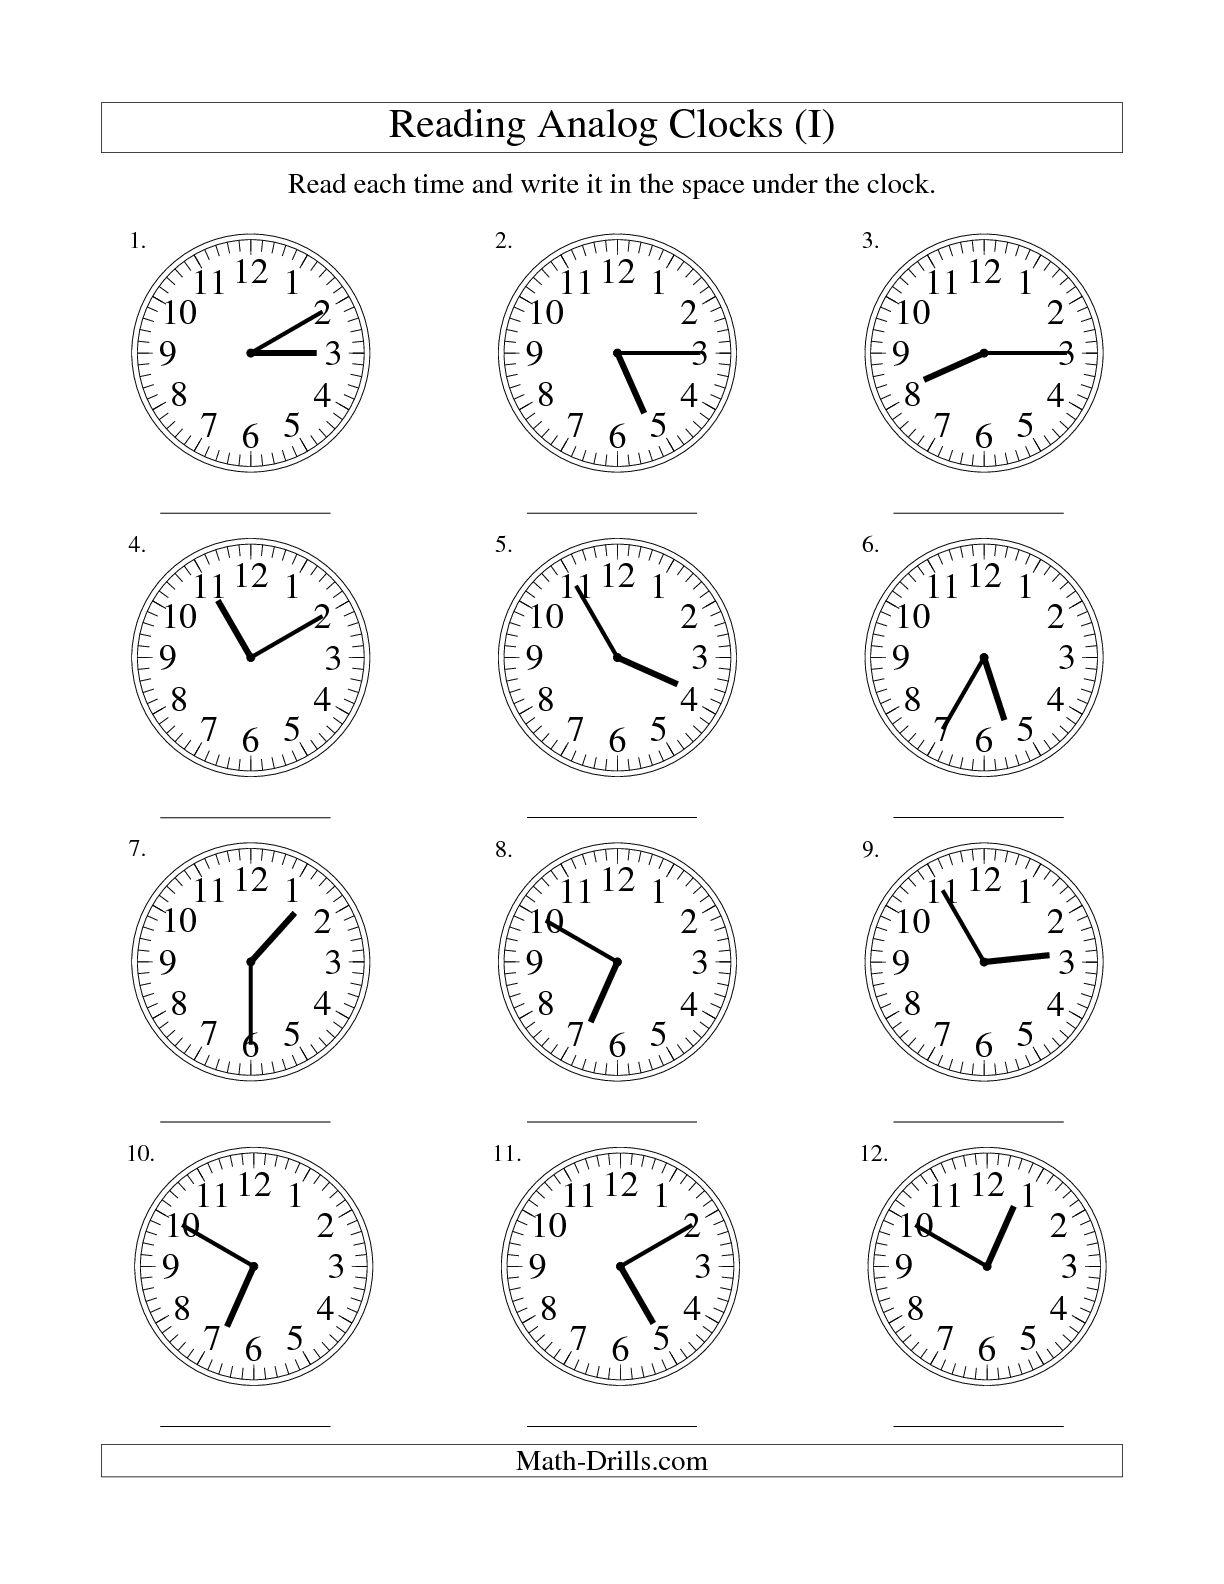 15 Best Images Of 5 Minute Time Intervals Worksheets